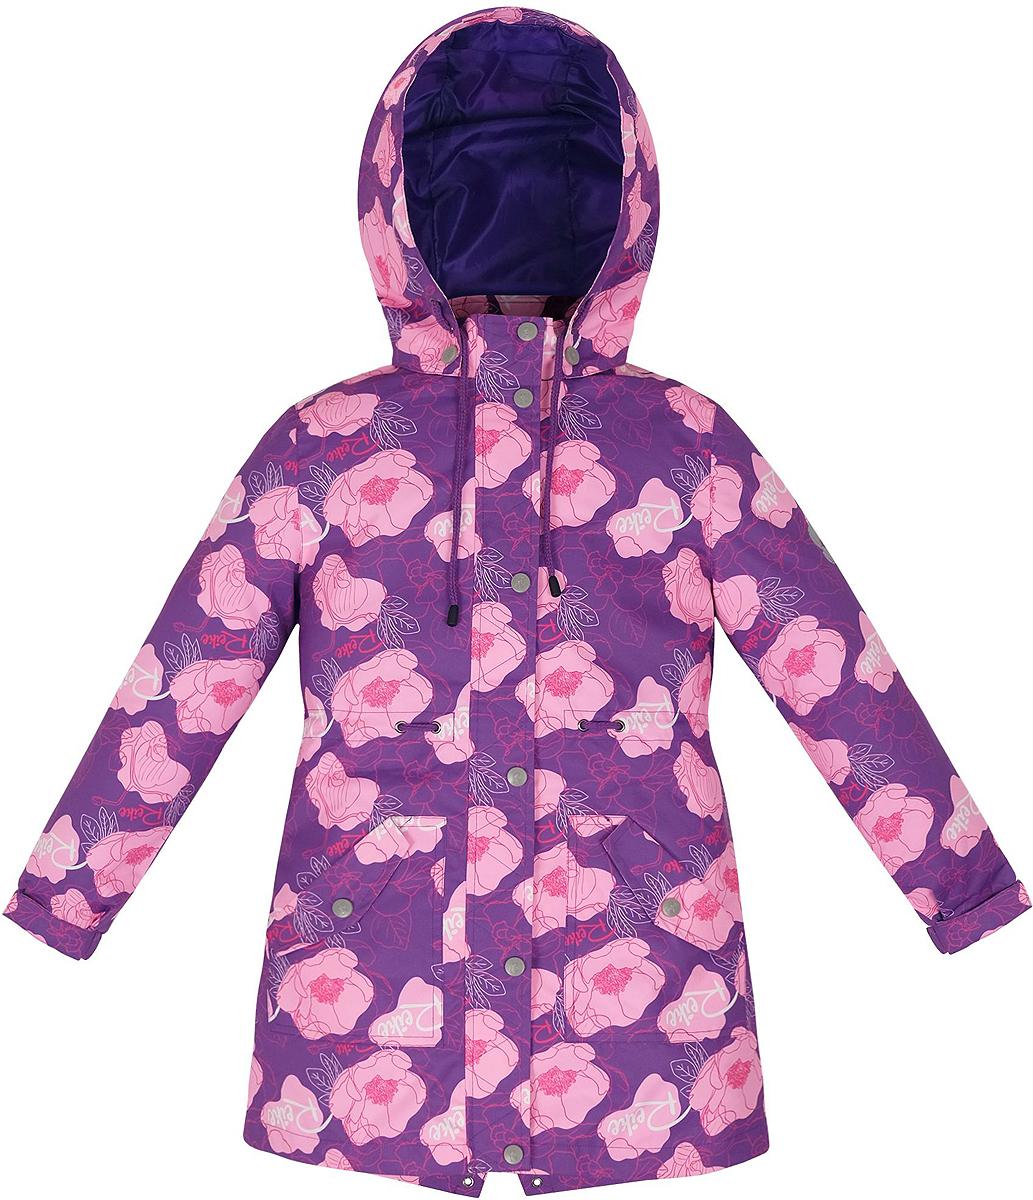 Плащ35 948 335_Mallow violet